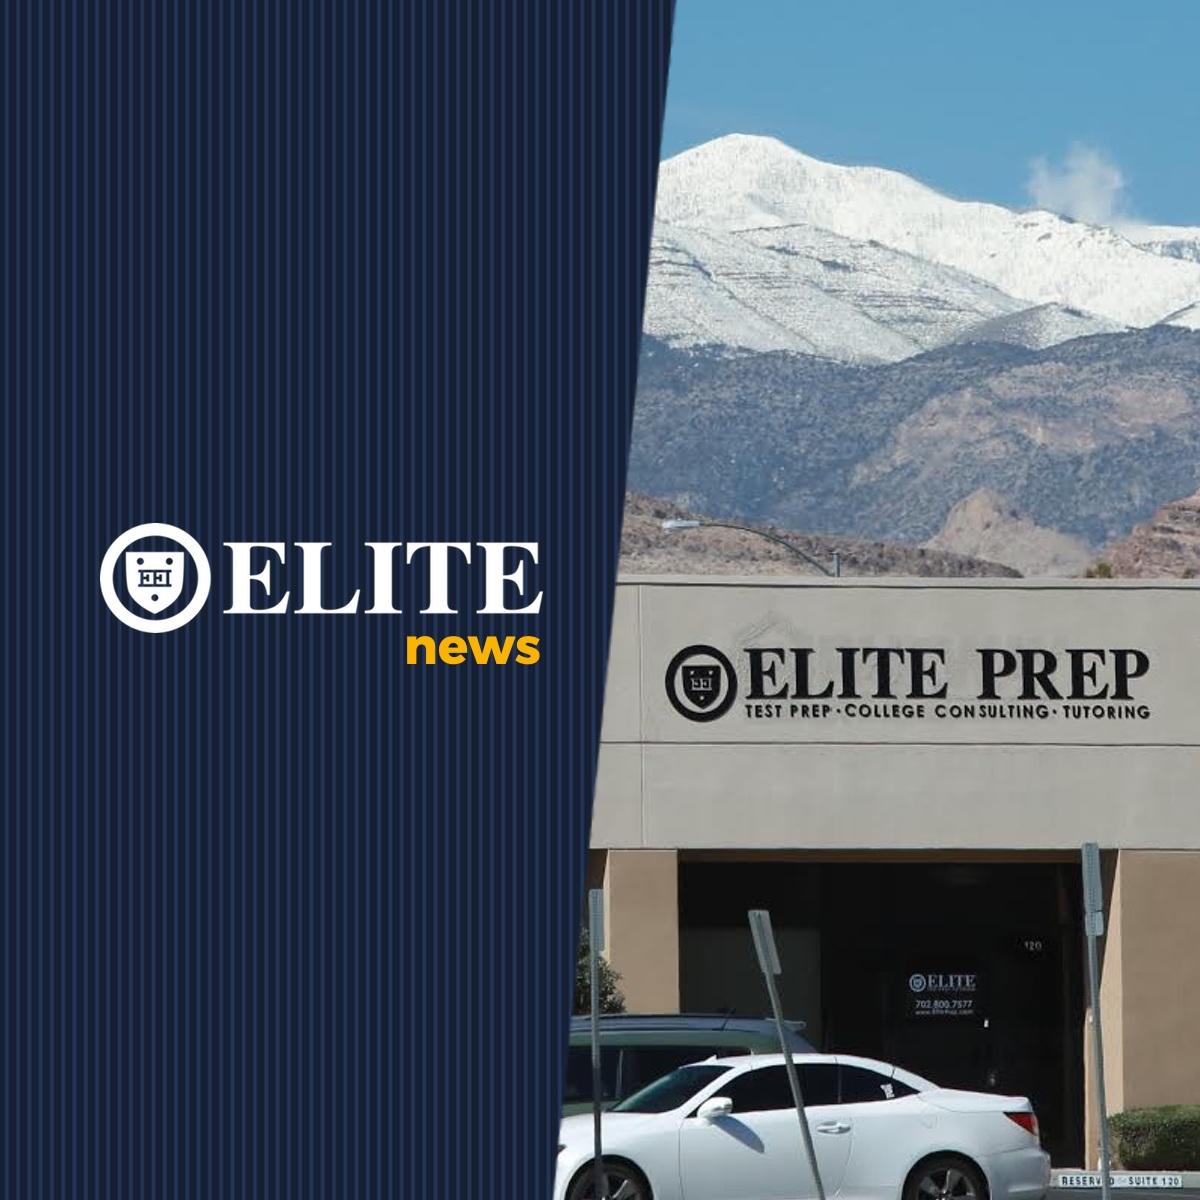 Elite Prep Celebrates Grand Opening of New Branch Office in Las Vegas